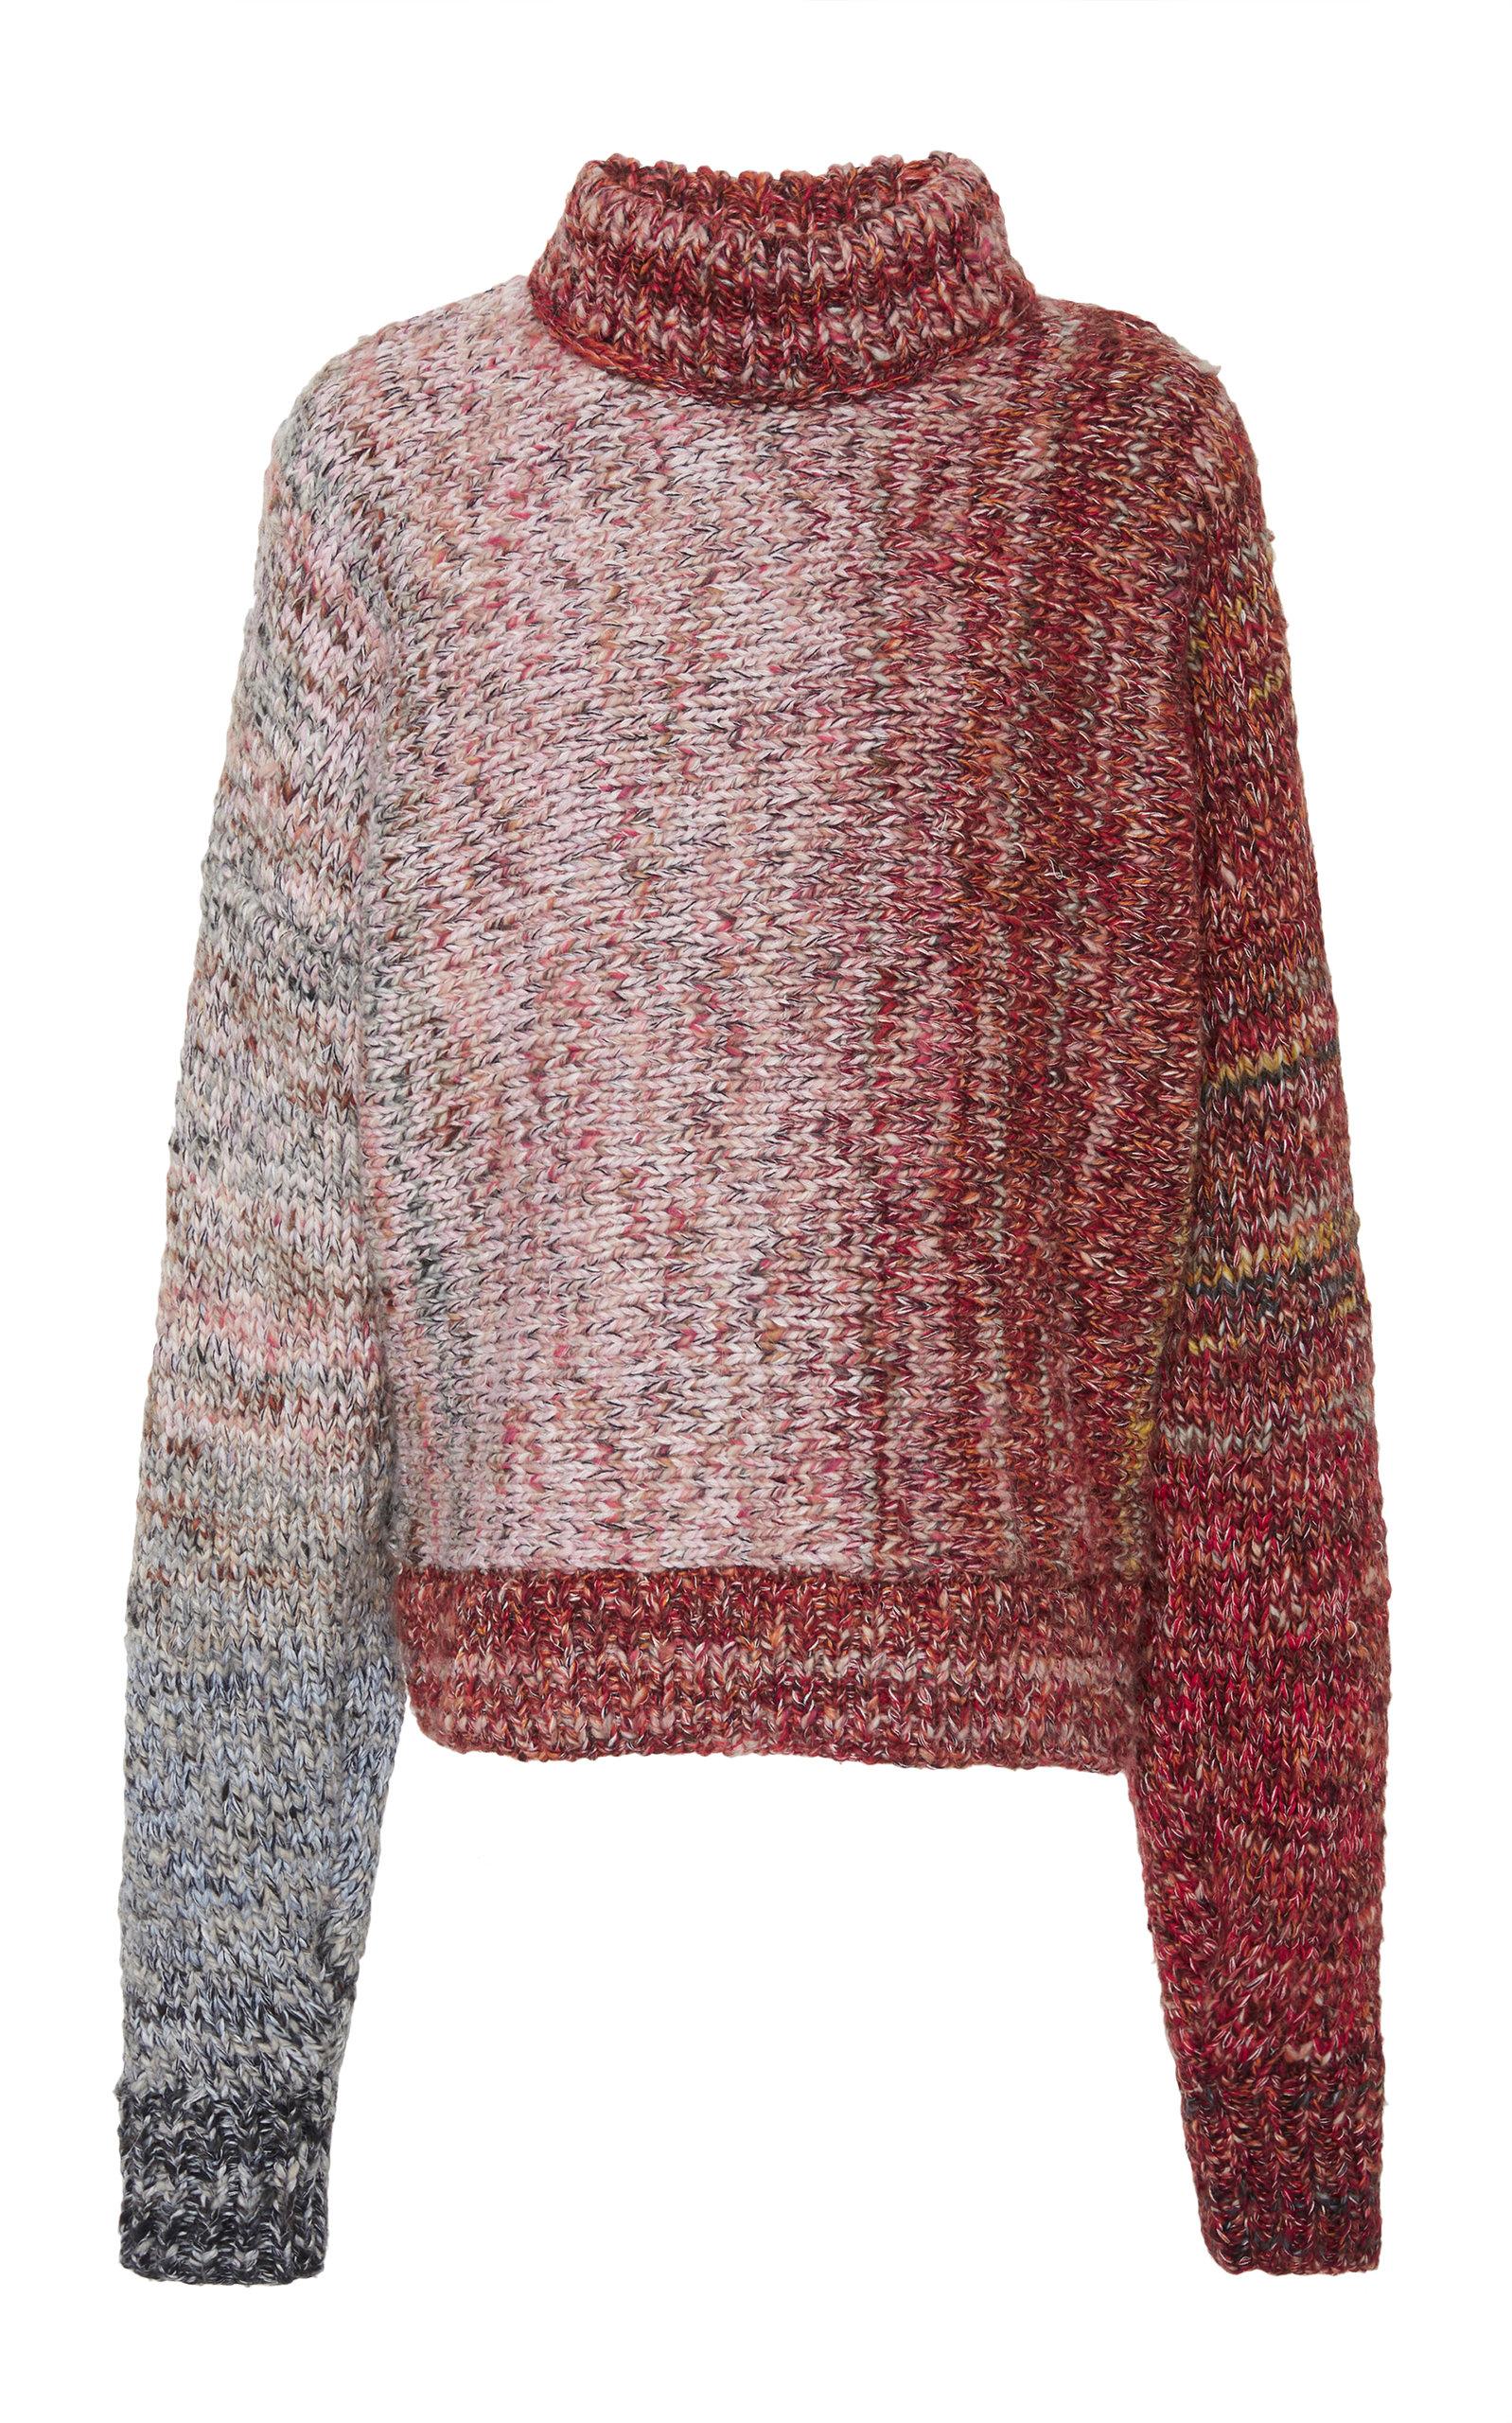 Chunky Yarn Mix Sweater Victoria Beckham Sale 2018 New SdtiqGR